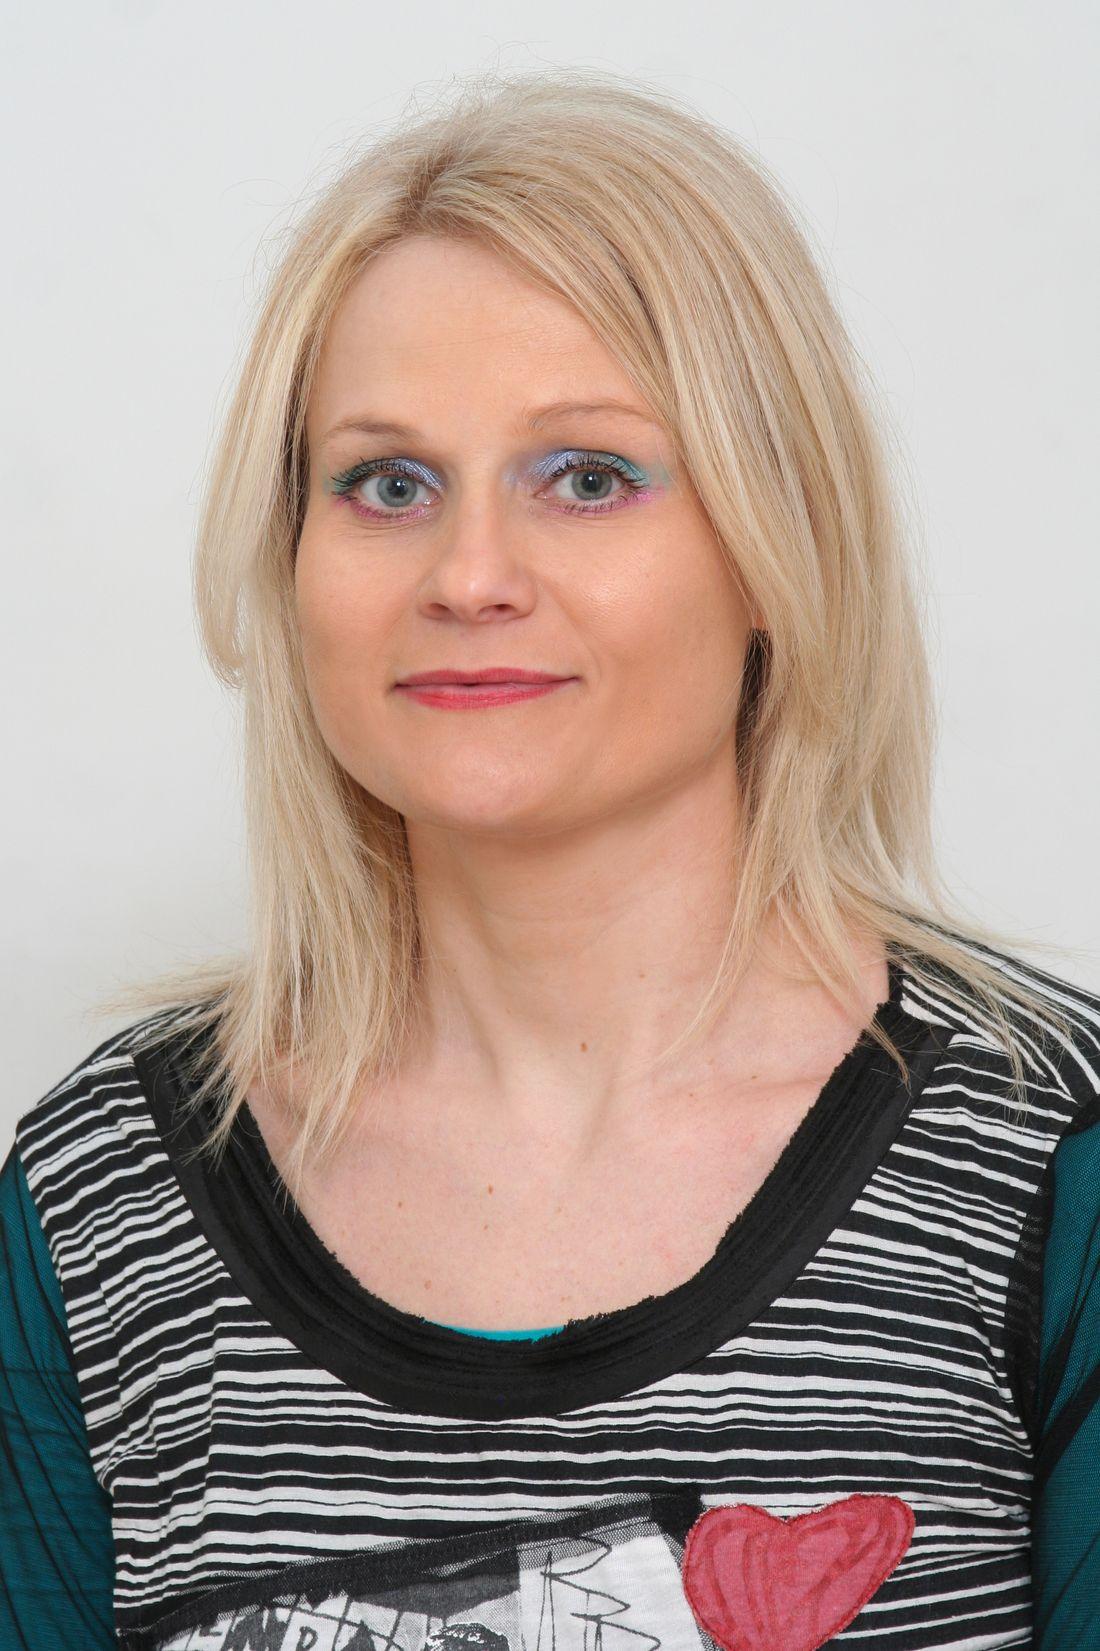 Monica Emanell